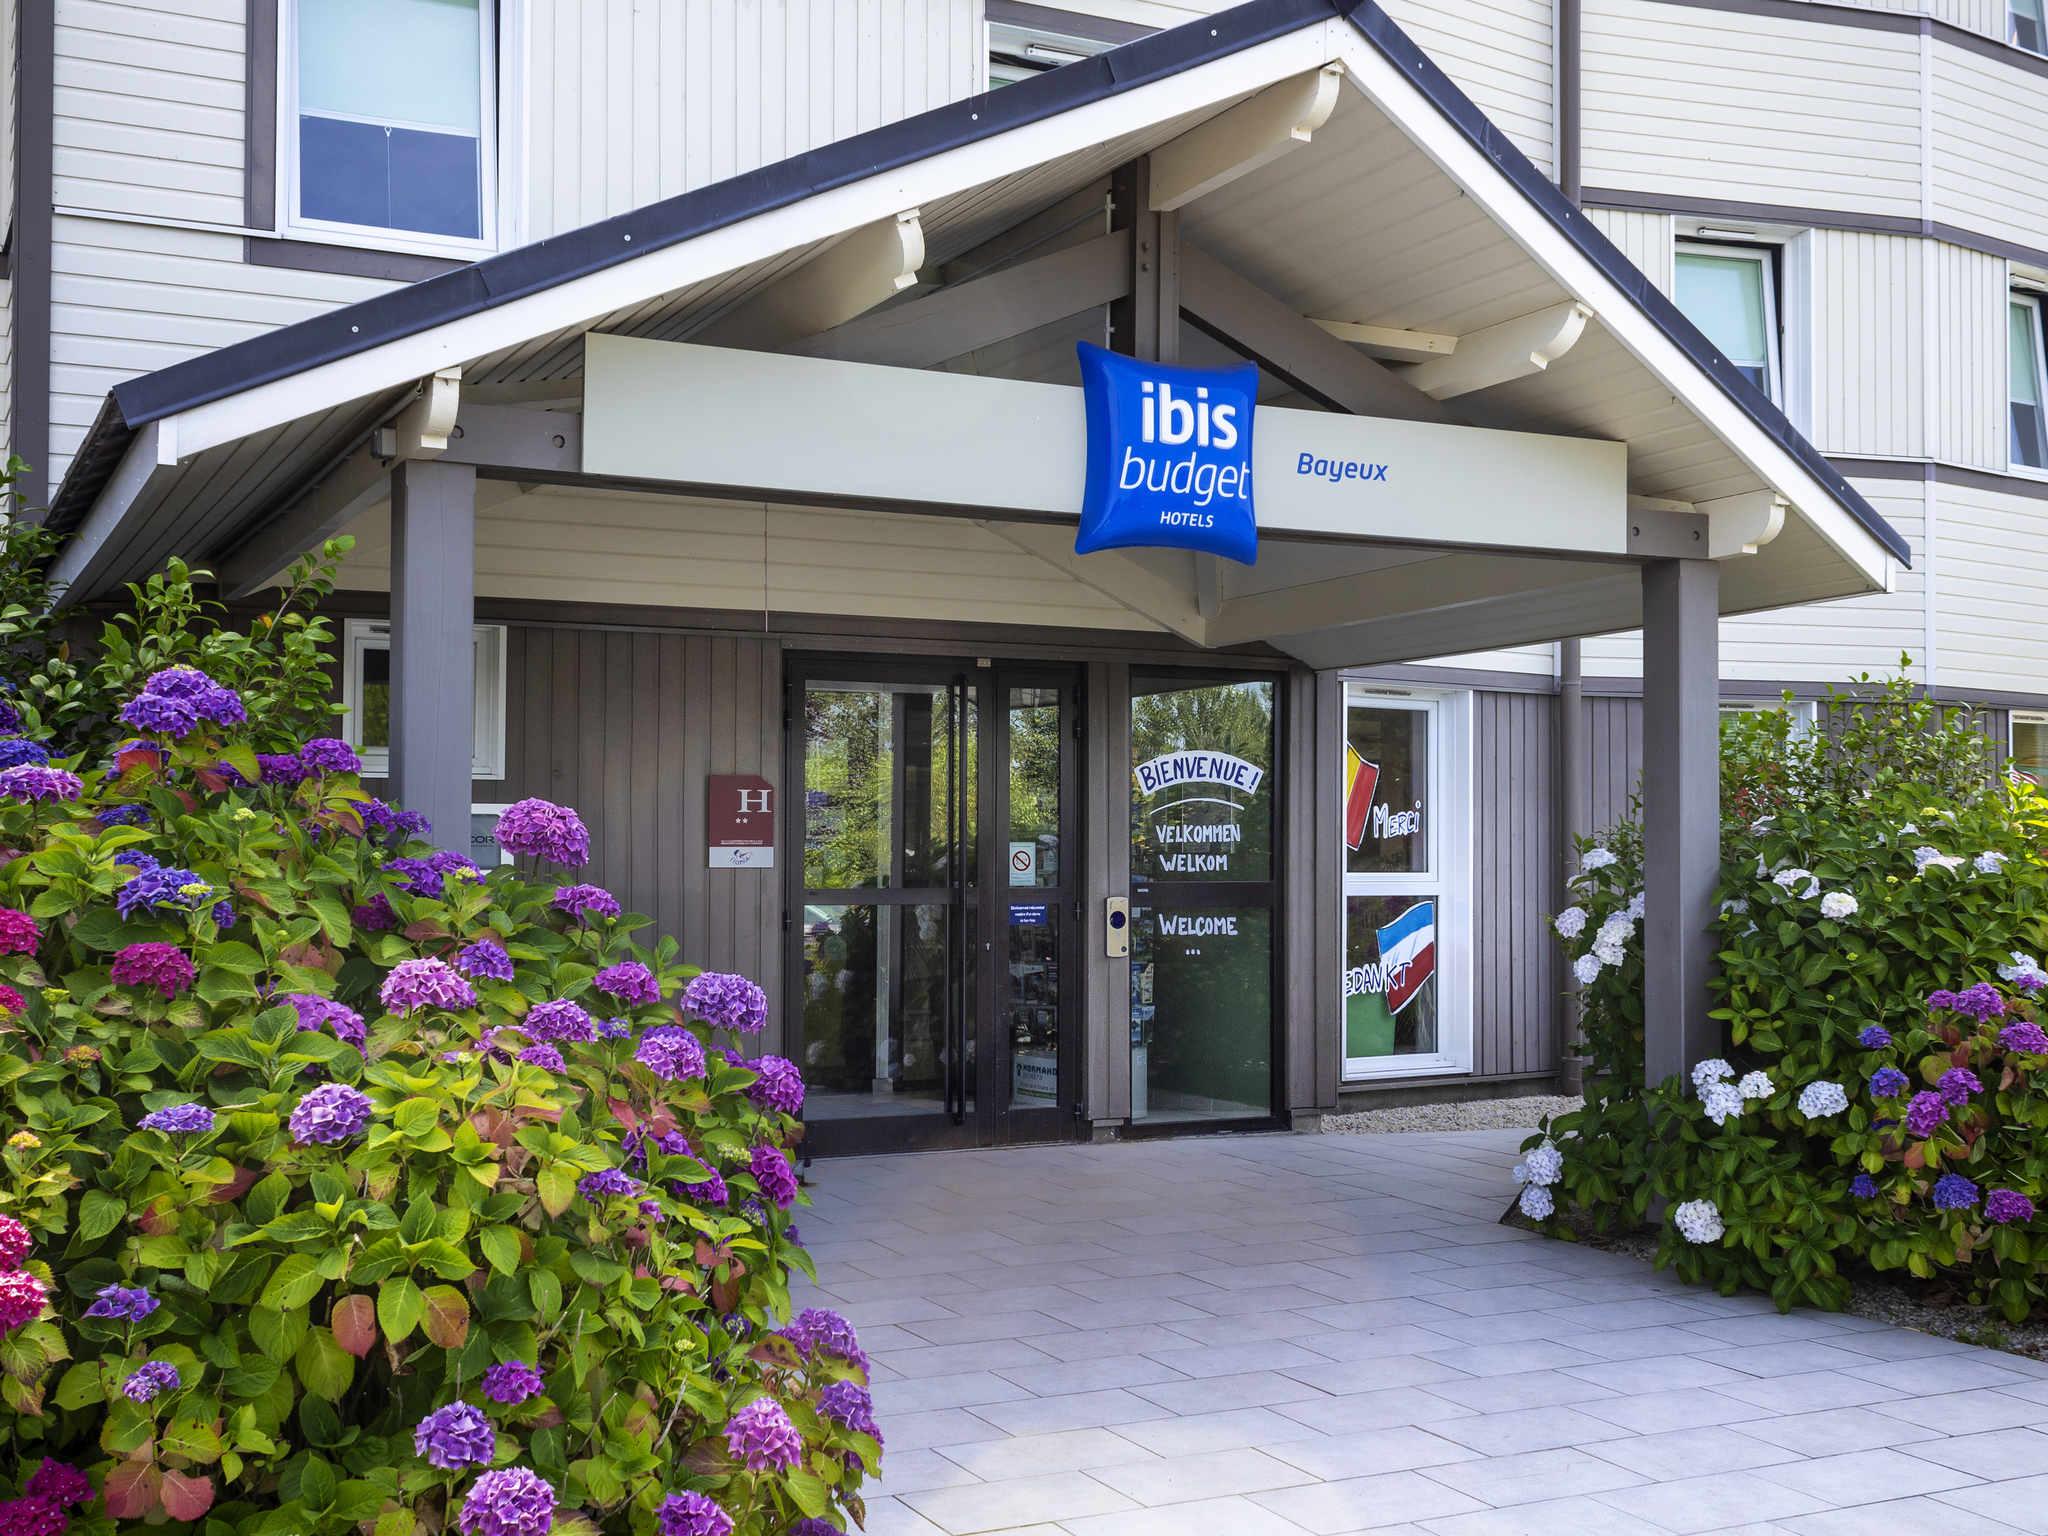 Hotel – ibis budget Bayeux